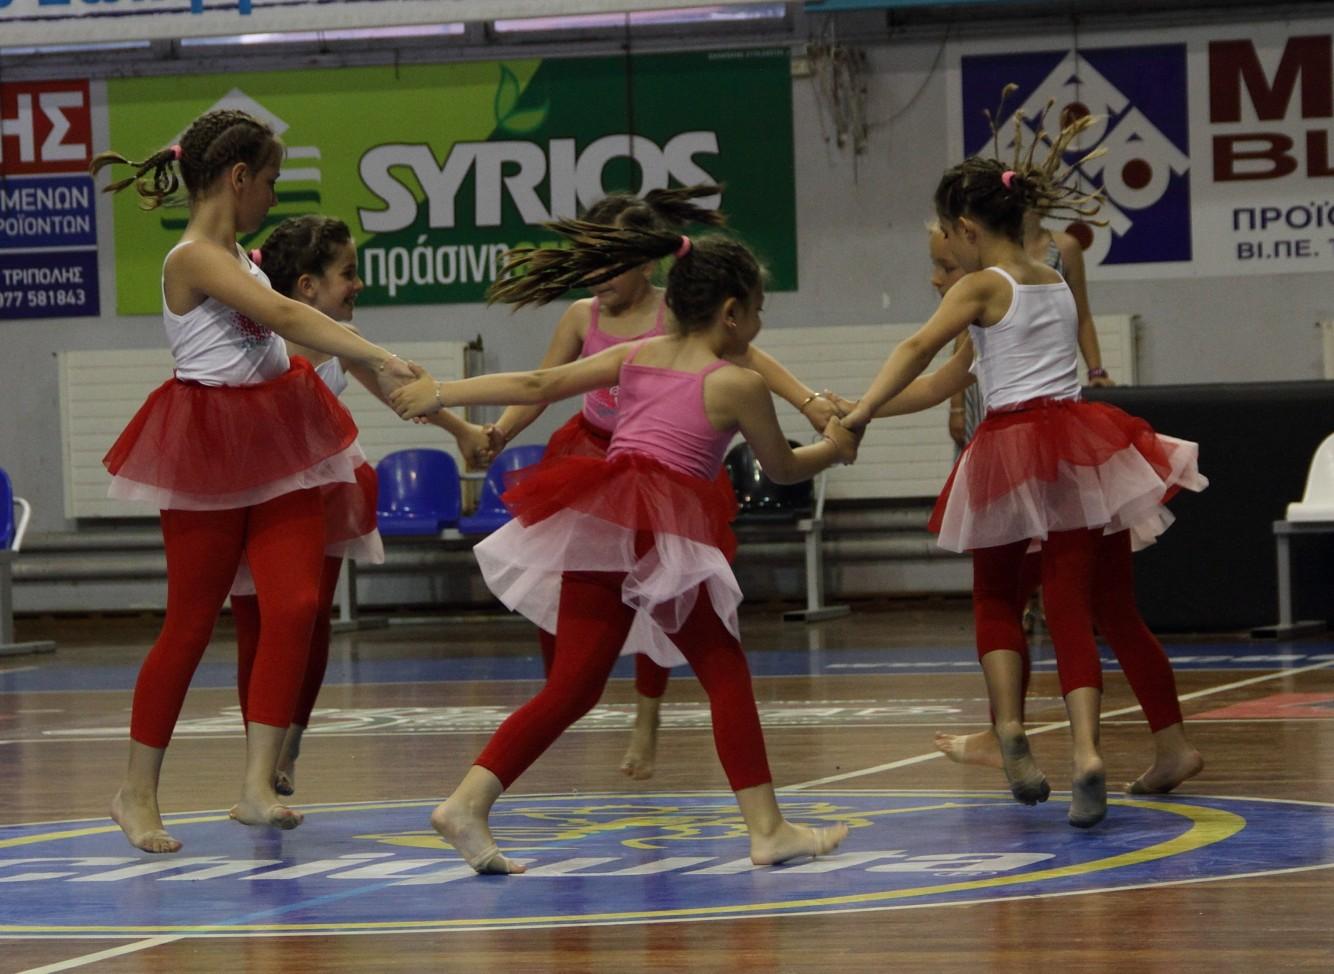 1o Τμήμα Modern Dance 4η Παράσταση Γυμναστηρίου »Top Gym»